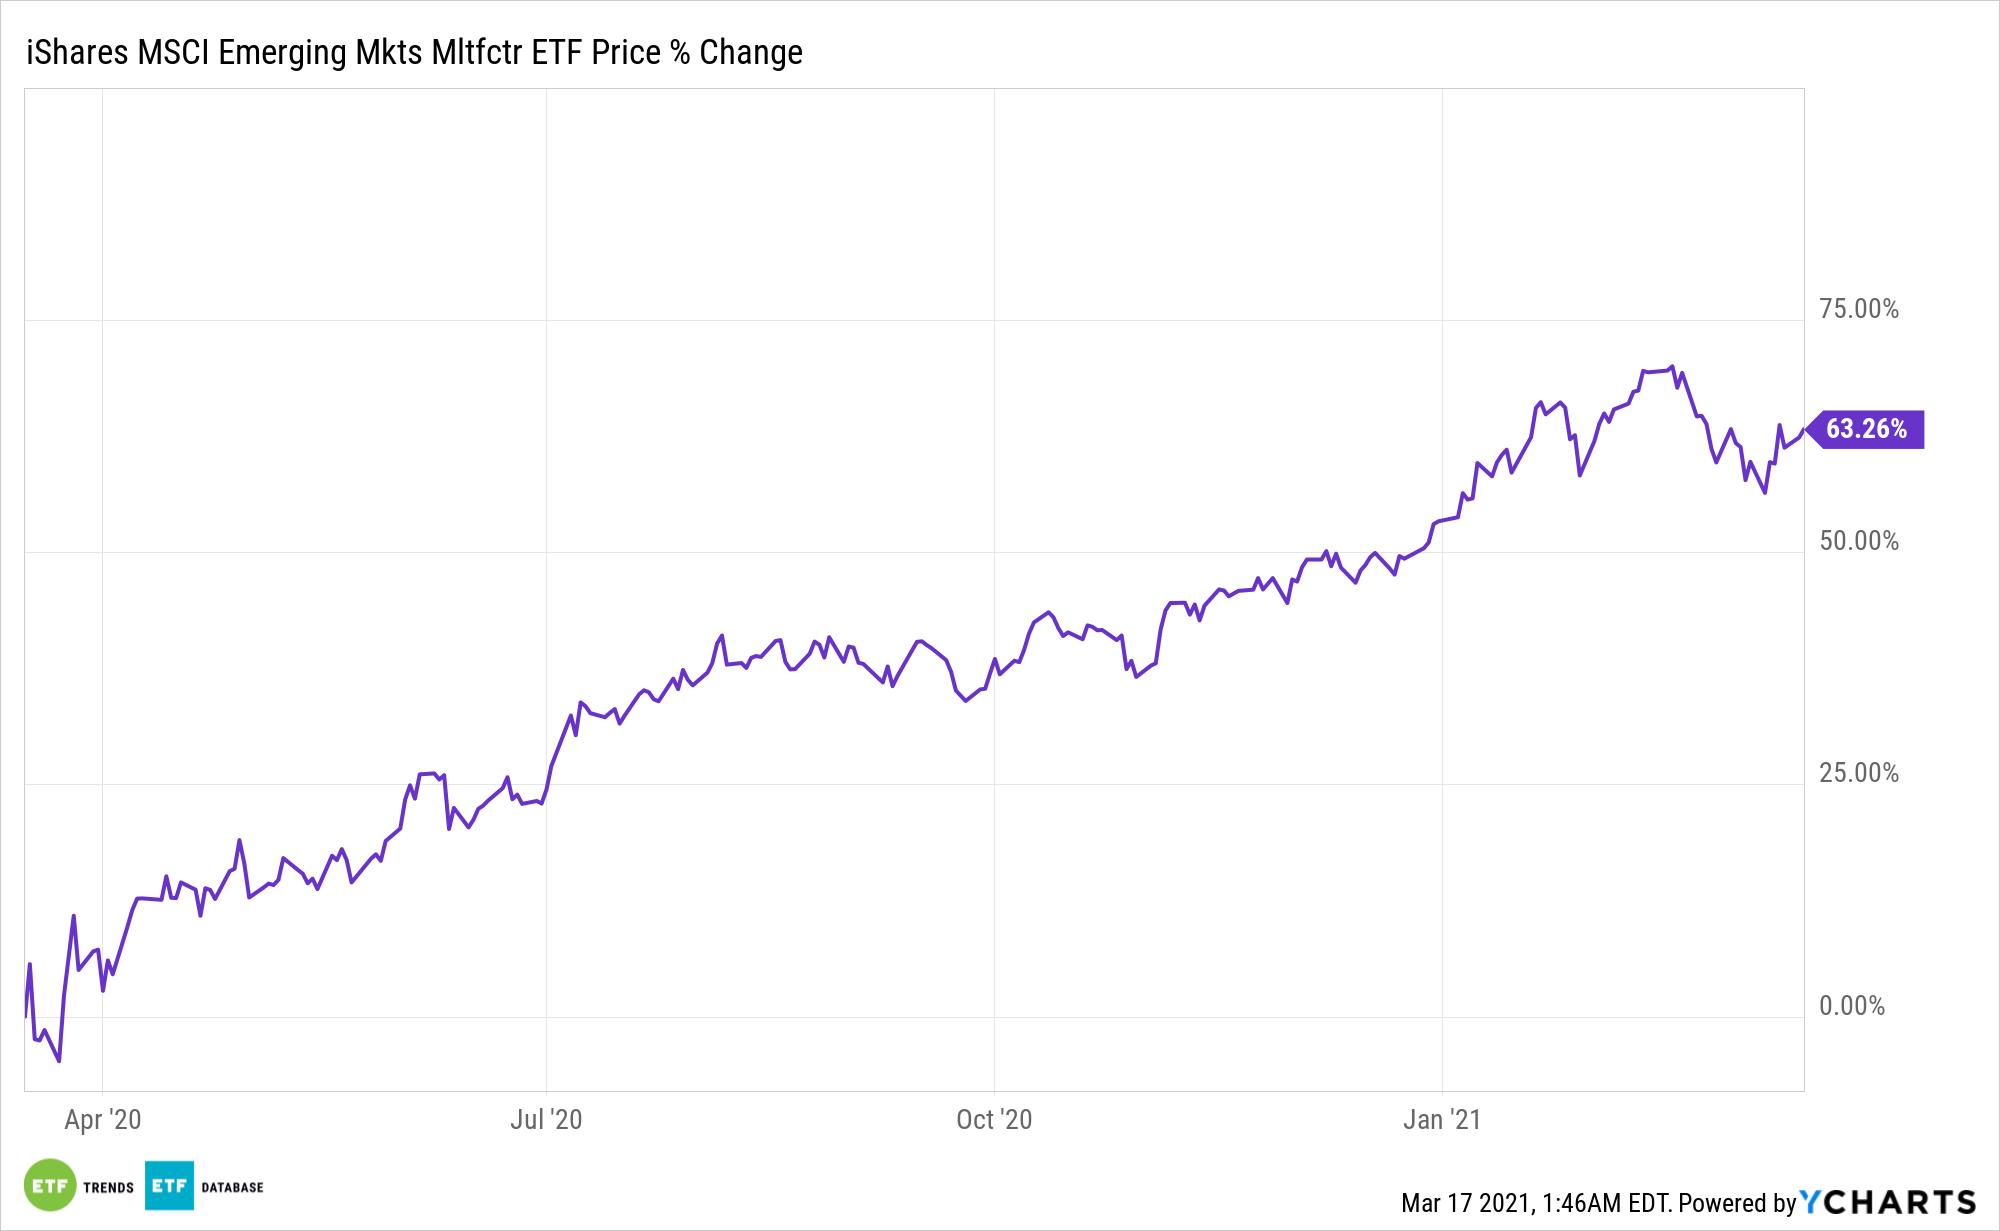 EMGF Chart